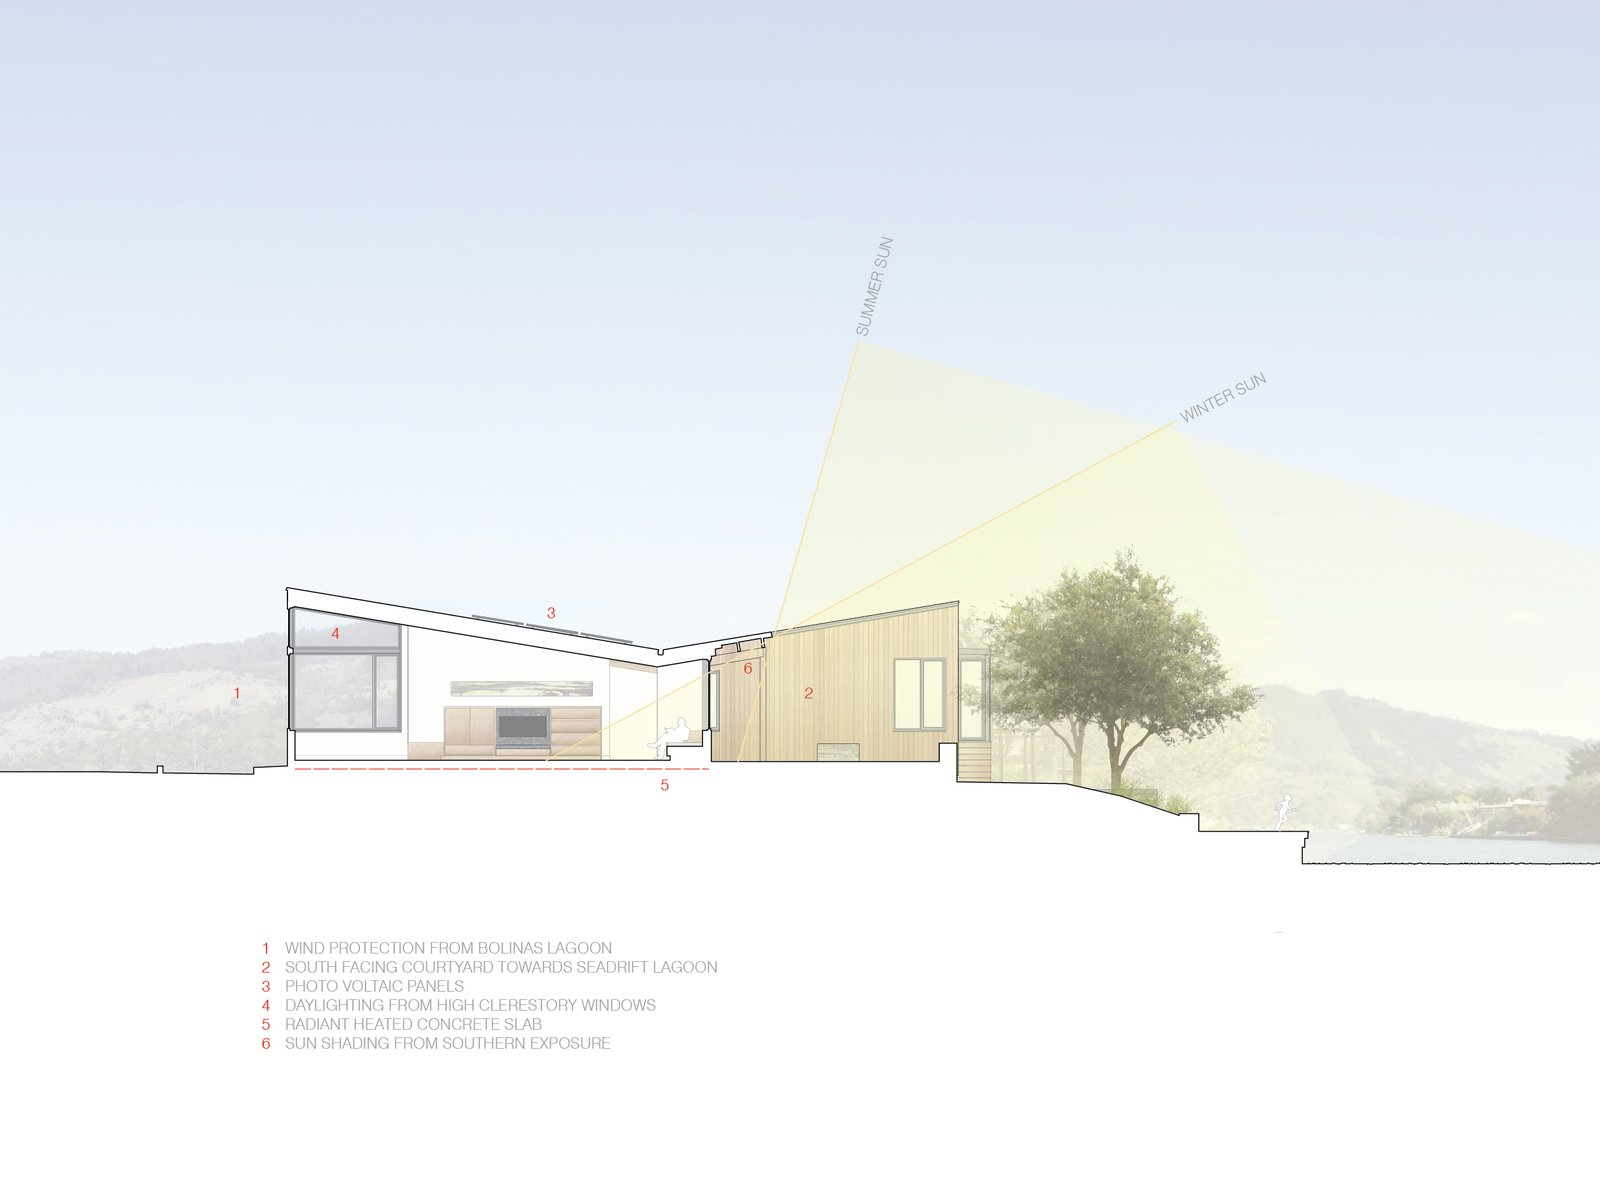 #TurnbullGriffinHaesloop #sustainability #outdoor #landscape   Stinson Beach Lagoon Residence by Turnbull Griffin Haesloop Architects